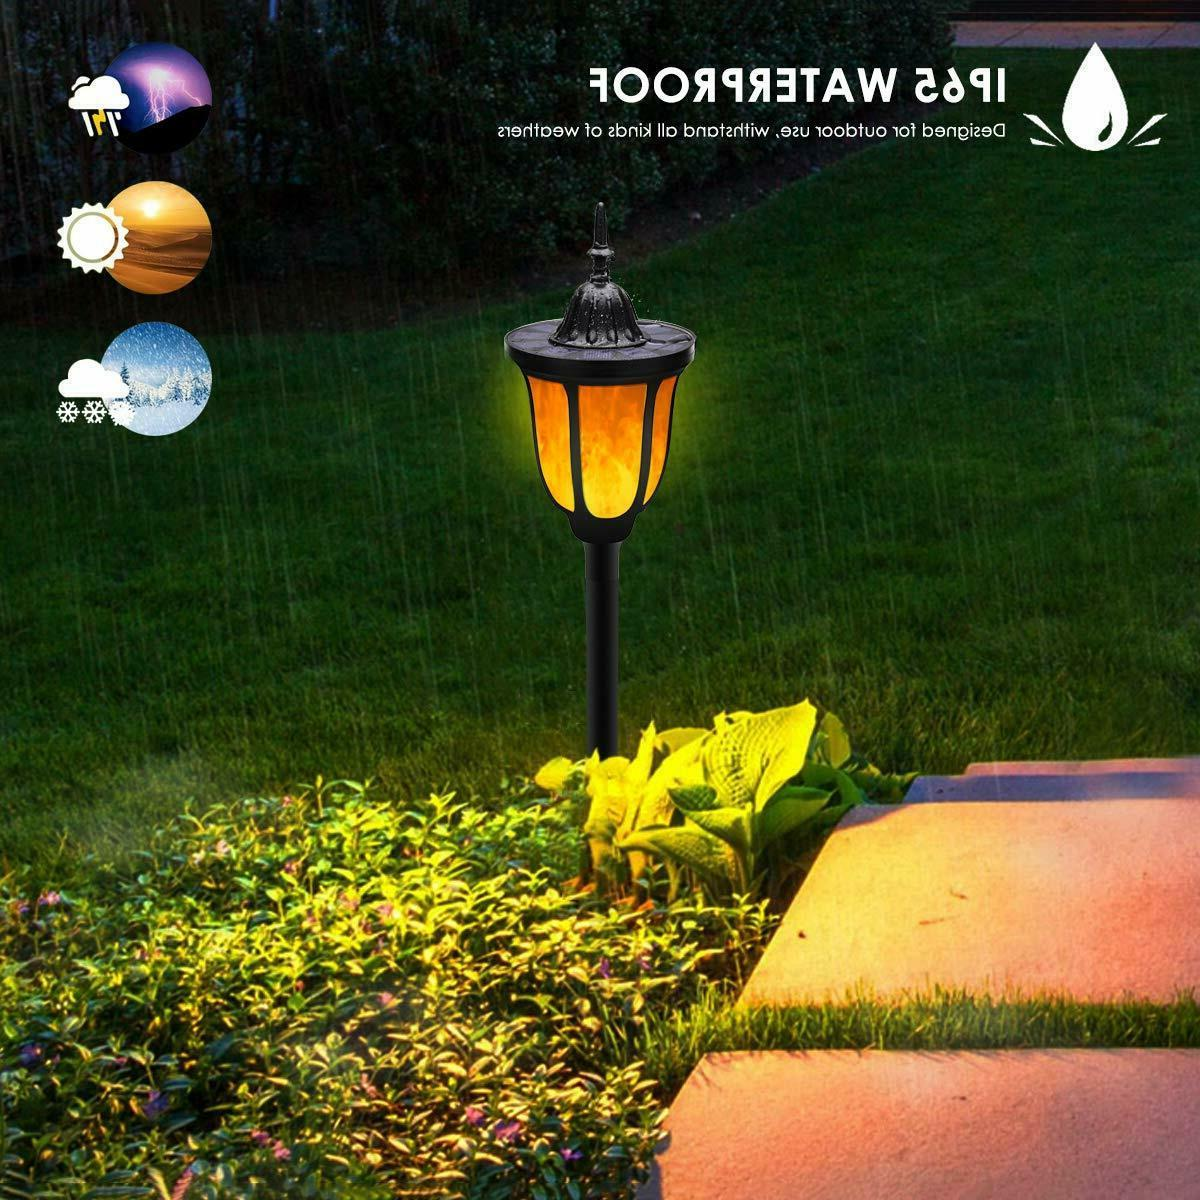 Solar Flame Waterproof Flames Solar Garden Spotlights